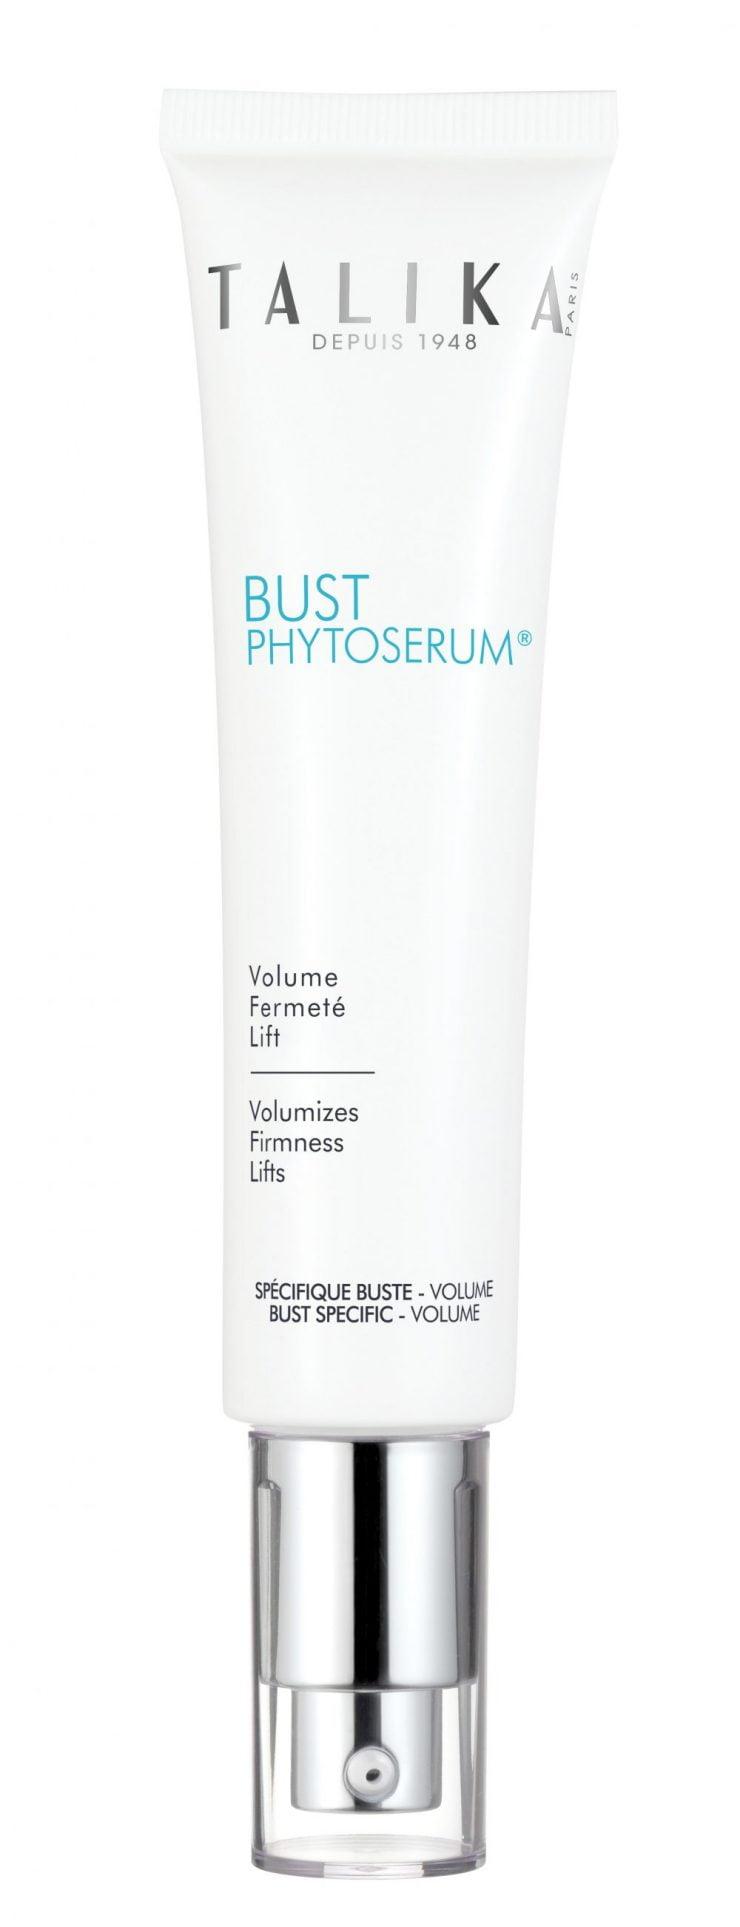 Bust Phytoserum